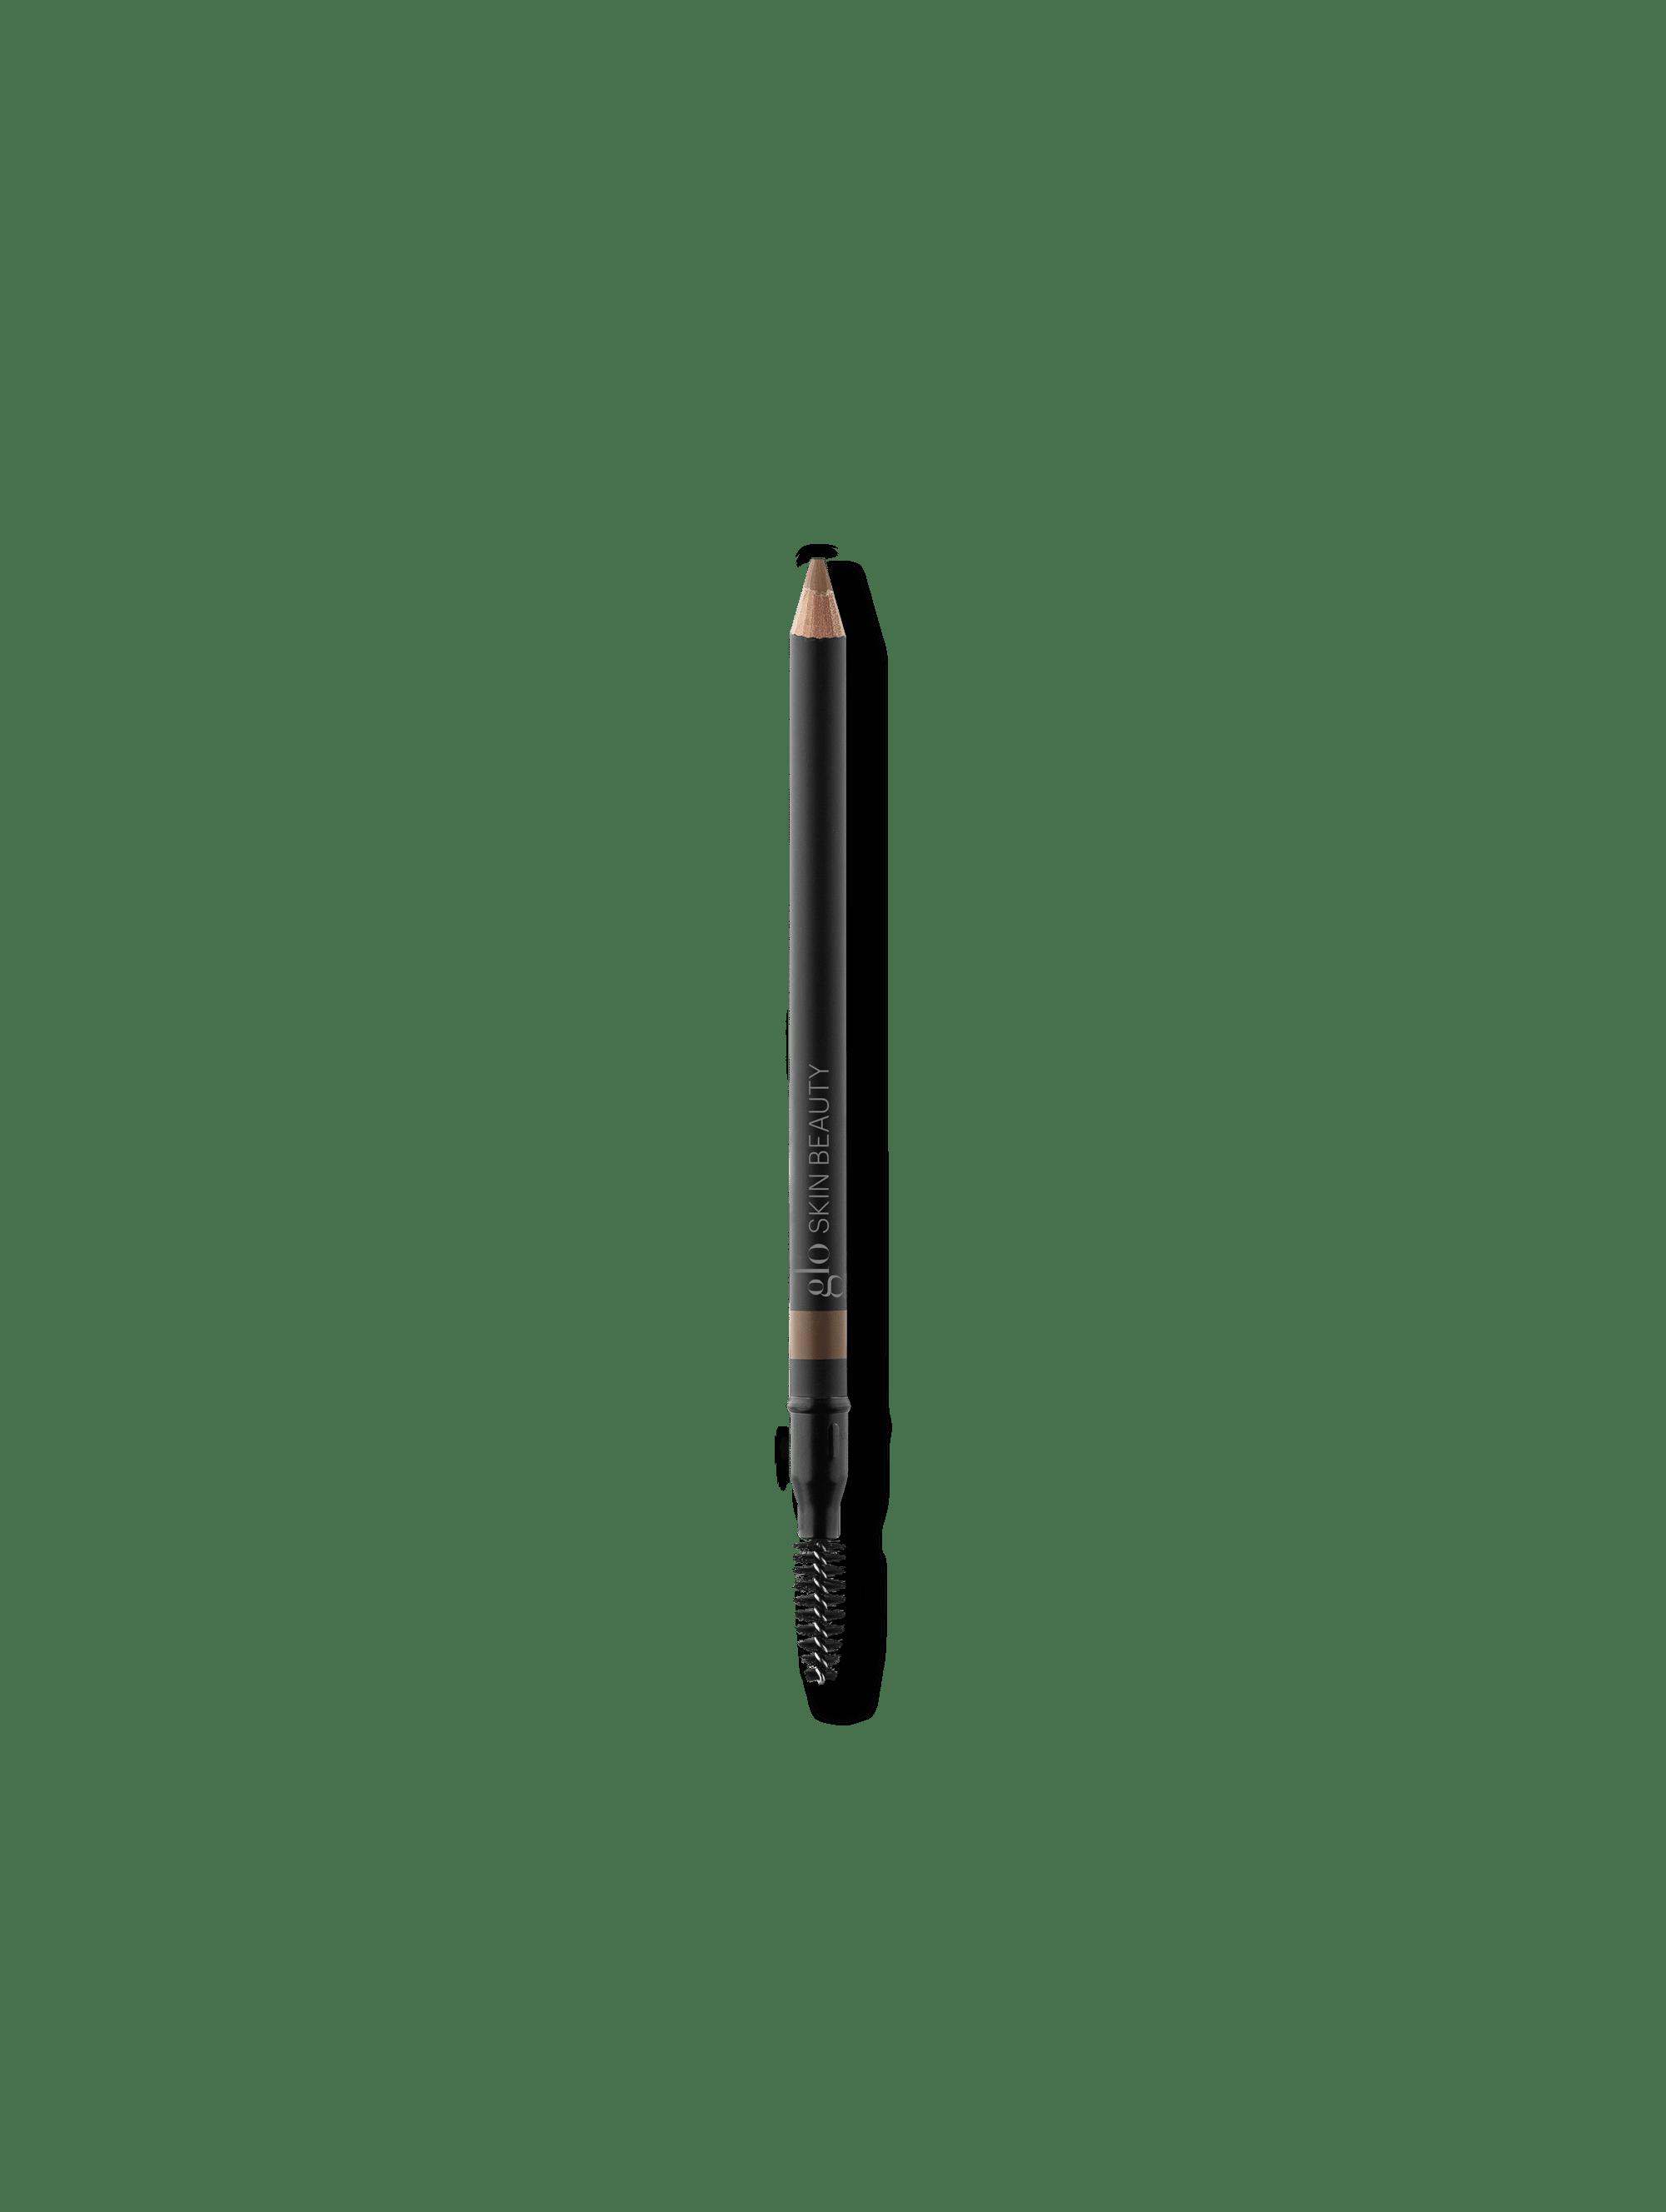 Image of Precision Brow Pencil